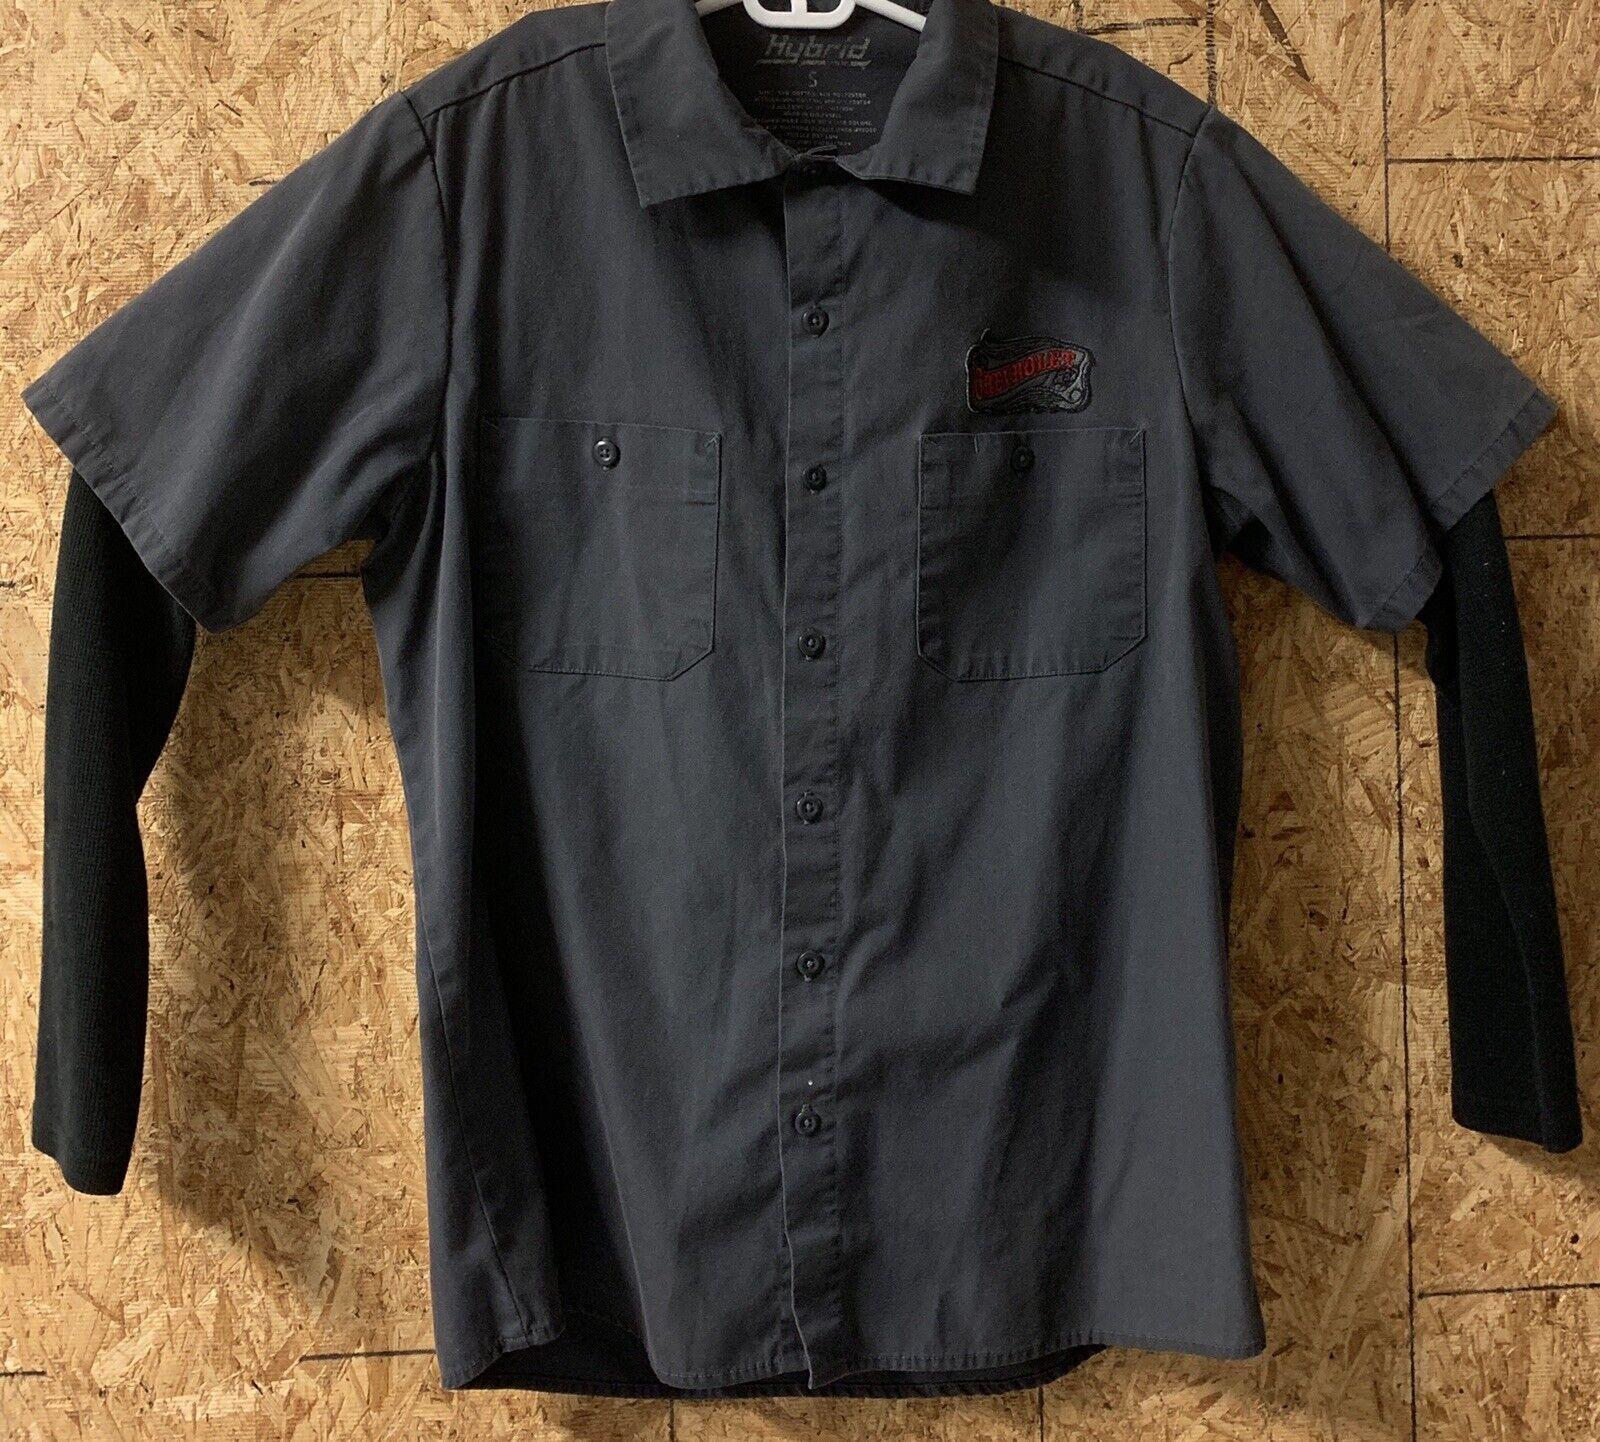 Chevrolet Hybrid Button Up Shirt Size S